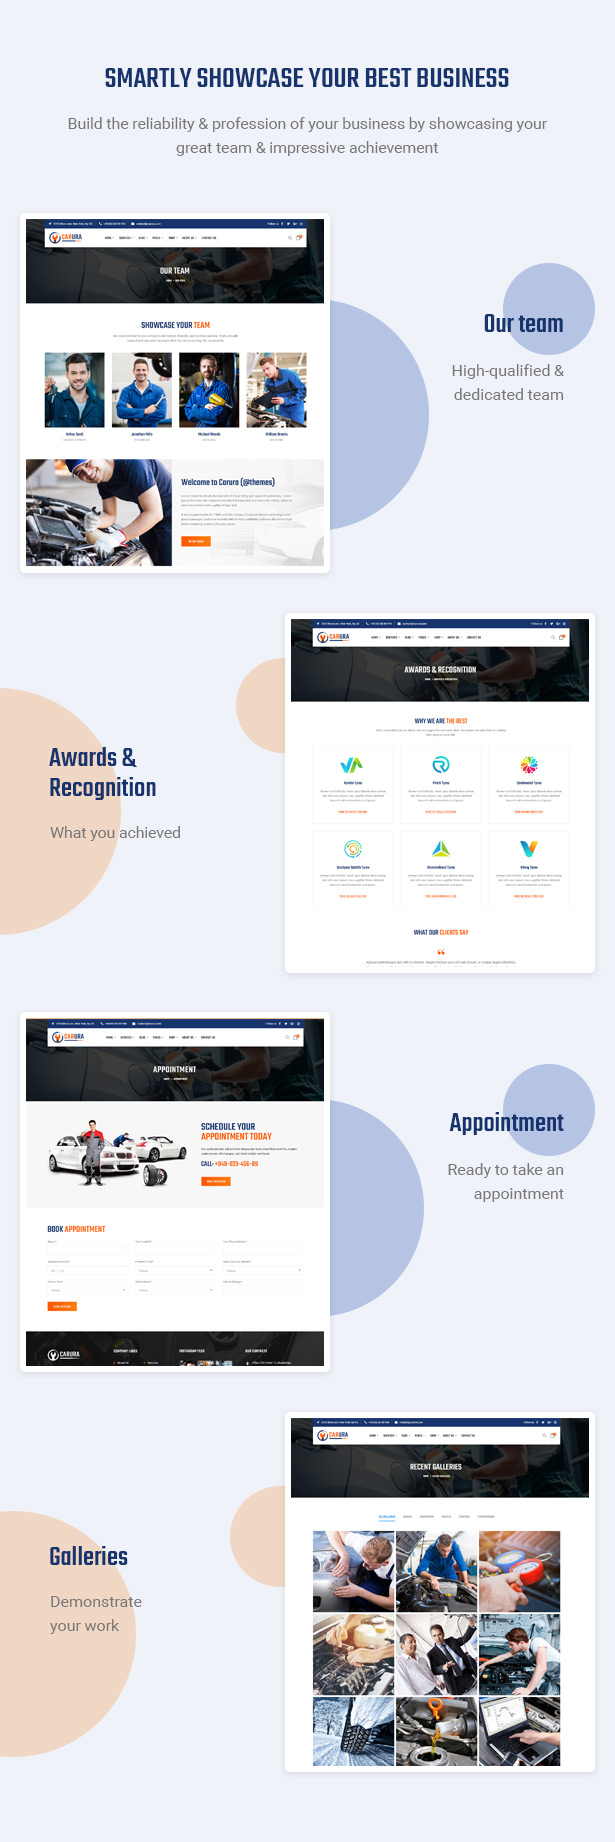 Effektiv Reputation aufbauen - Carsao - Auto Service & Auto Mechanic WordPress Theme